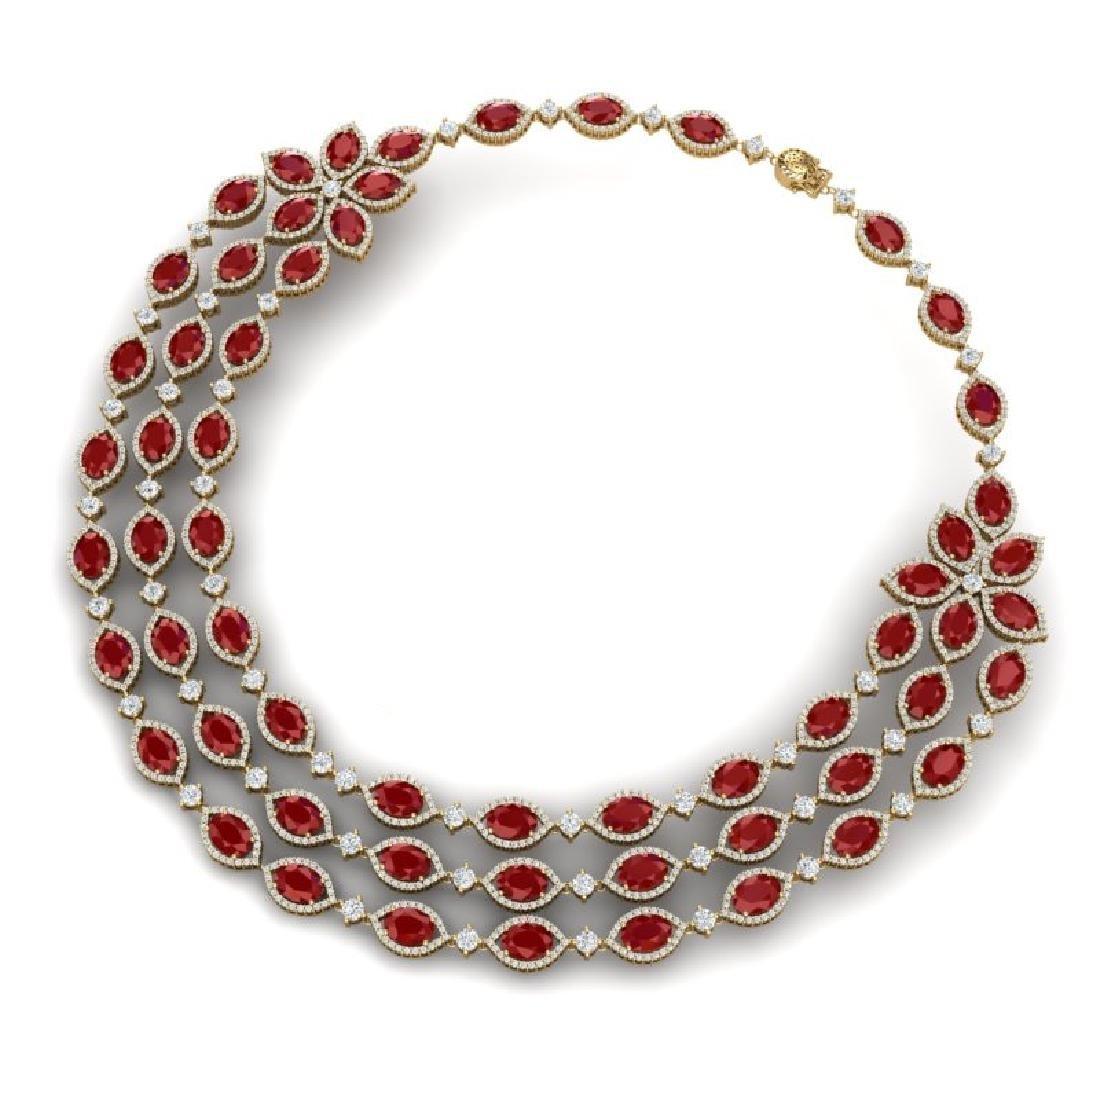 85.81 CTW Royalty Ruby & VS Diamond Necklace 18K Yellow - 2